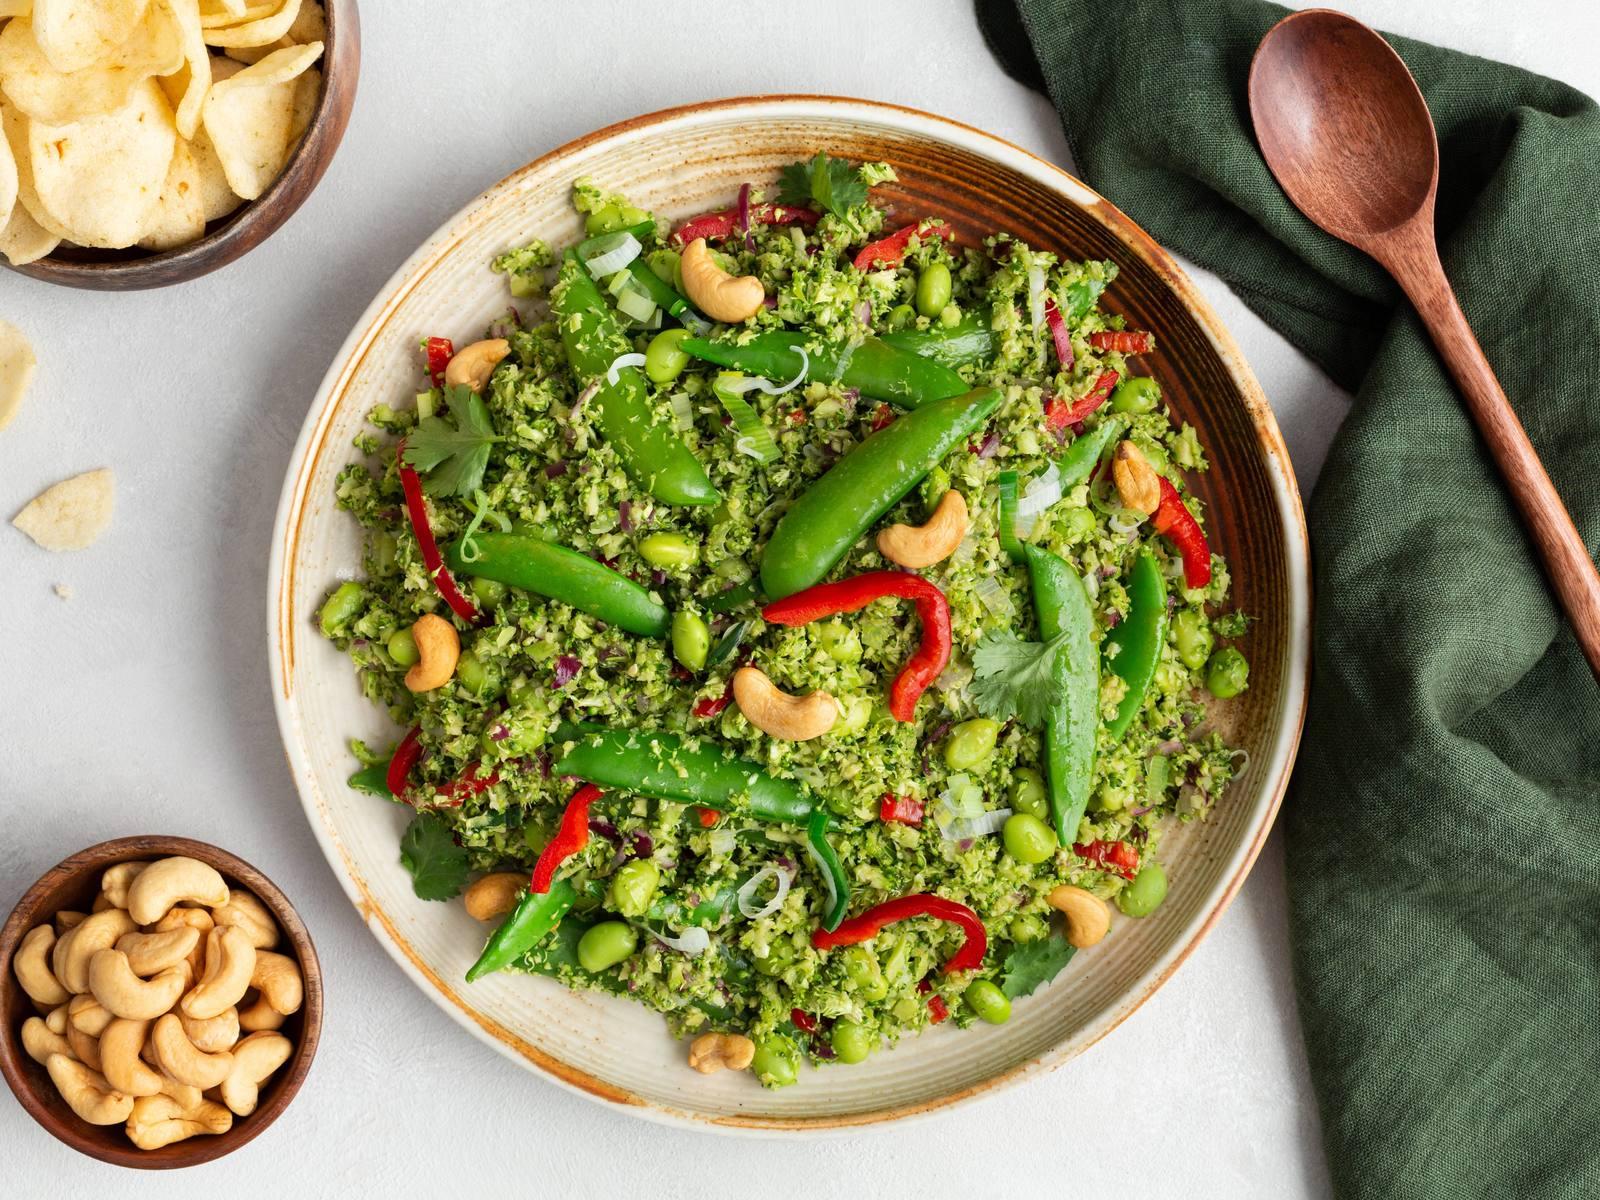 Groene wok met broccoli rijst en sugarsnaps